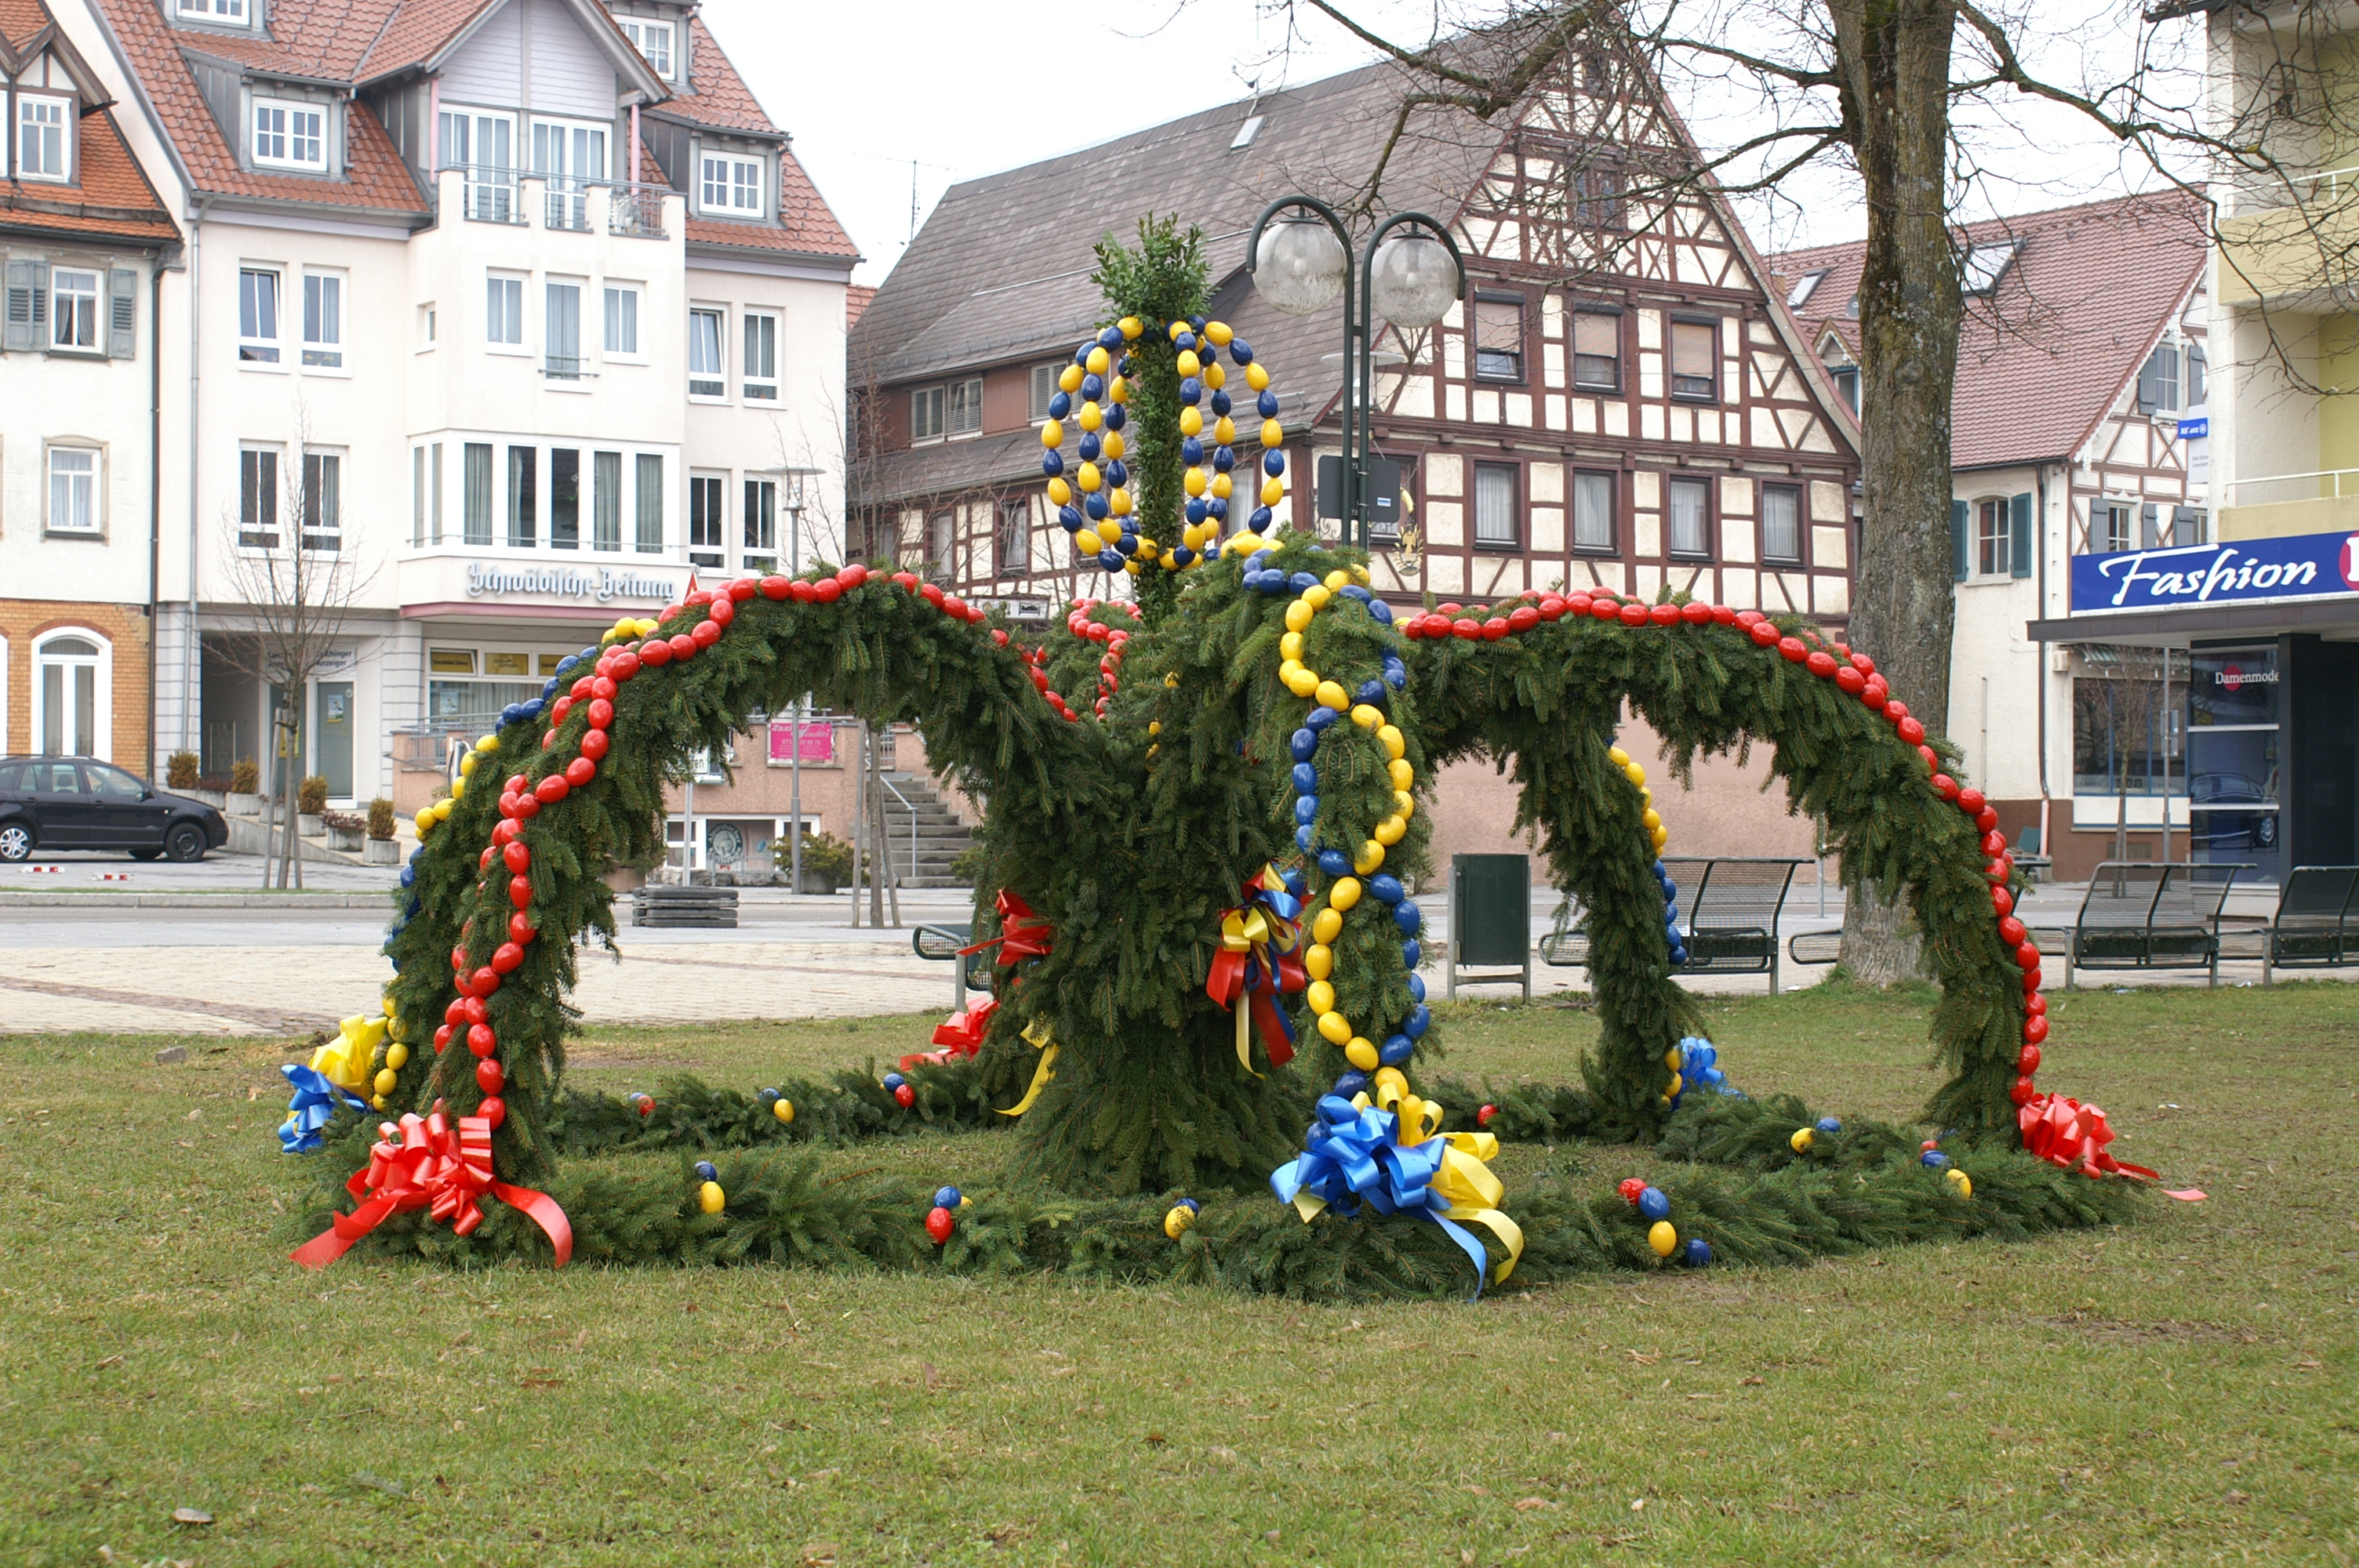 good topic not Wochenkurier heidelberg bekanntschaften remarkable, this very